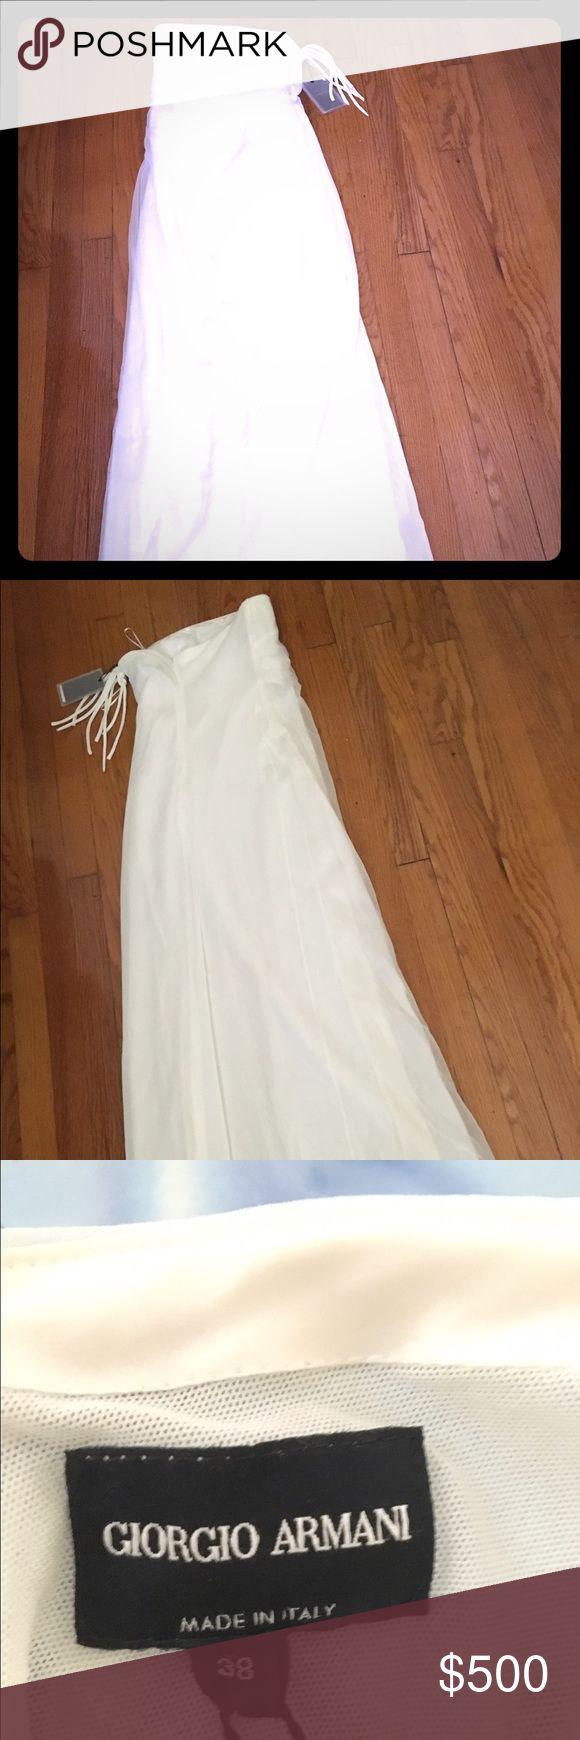 NWT Giorgio Armani dress Brand new strapless satin with chiffon overlay slightly off white genuine with tags Giorgio Armani dress. 👗👗👗 Could be worn as wedding dress. 🍾🍾🍾 VERY NICE!!! 😉 Giorgio Armani Dresses Strapless